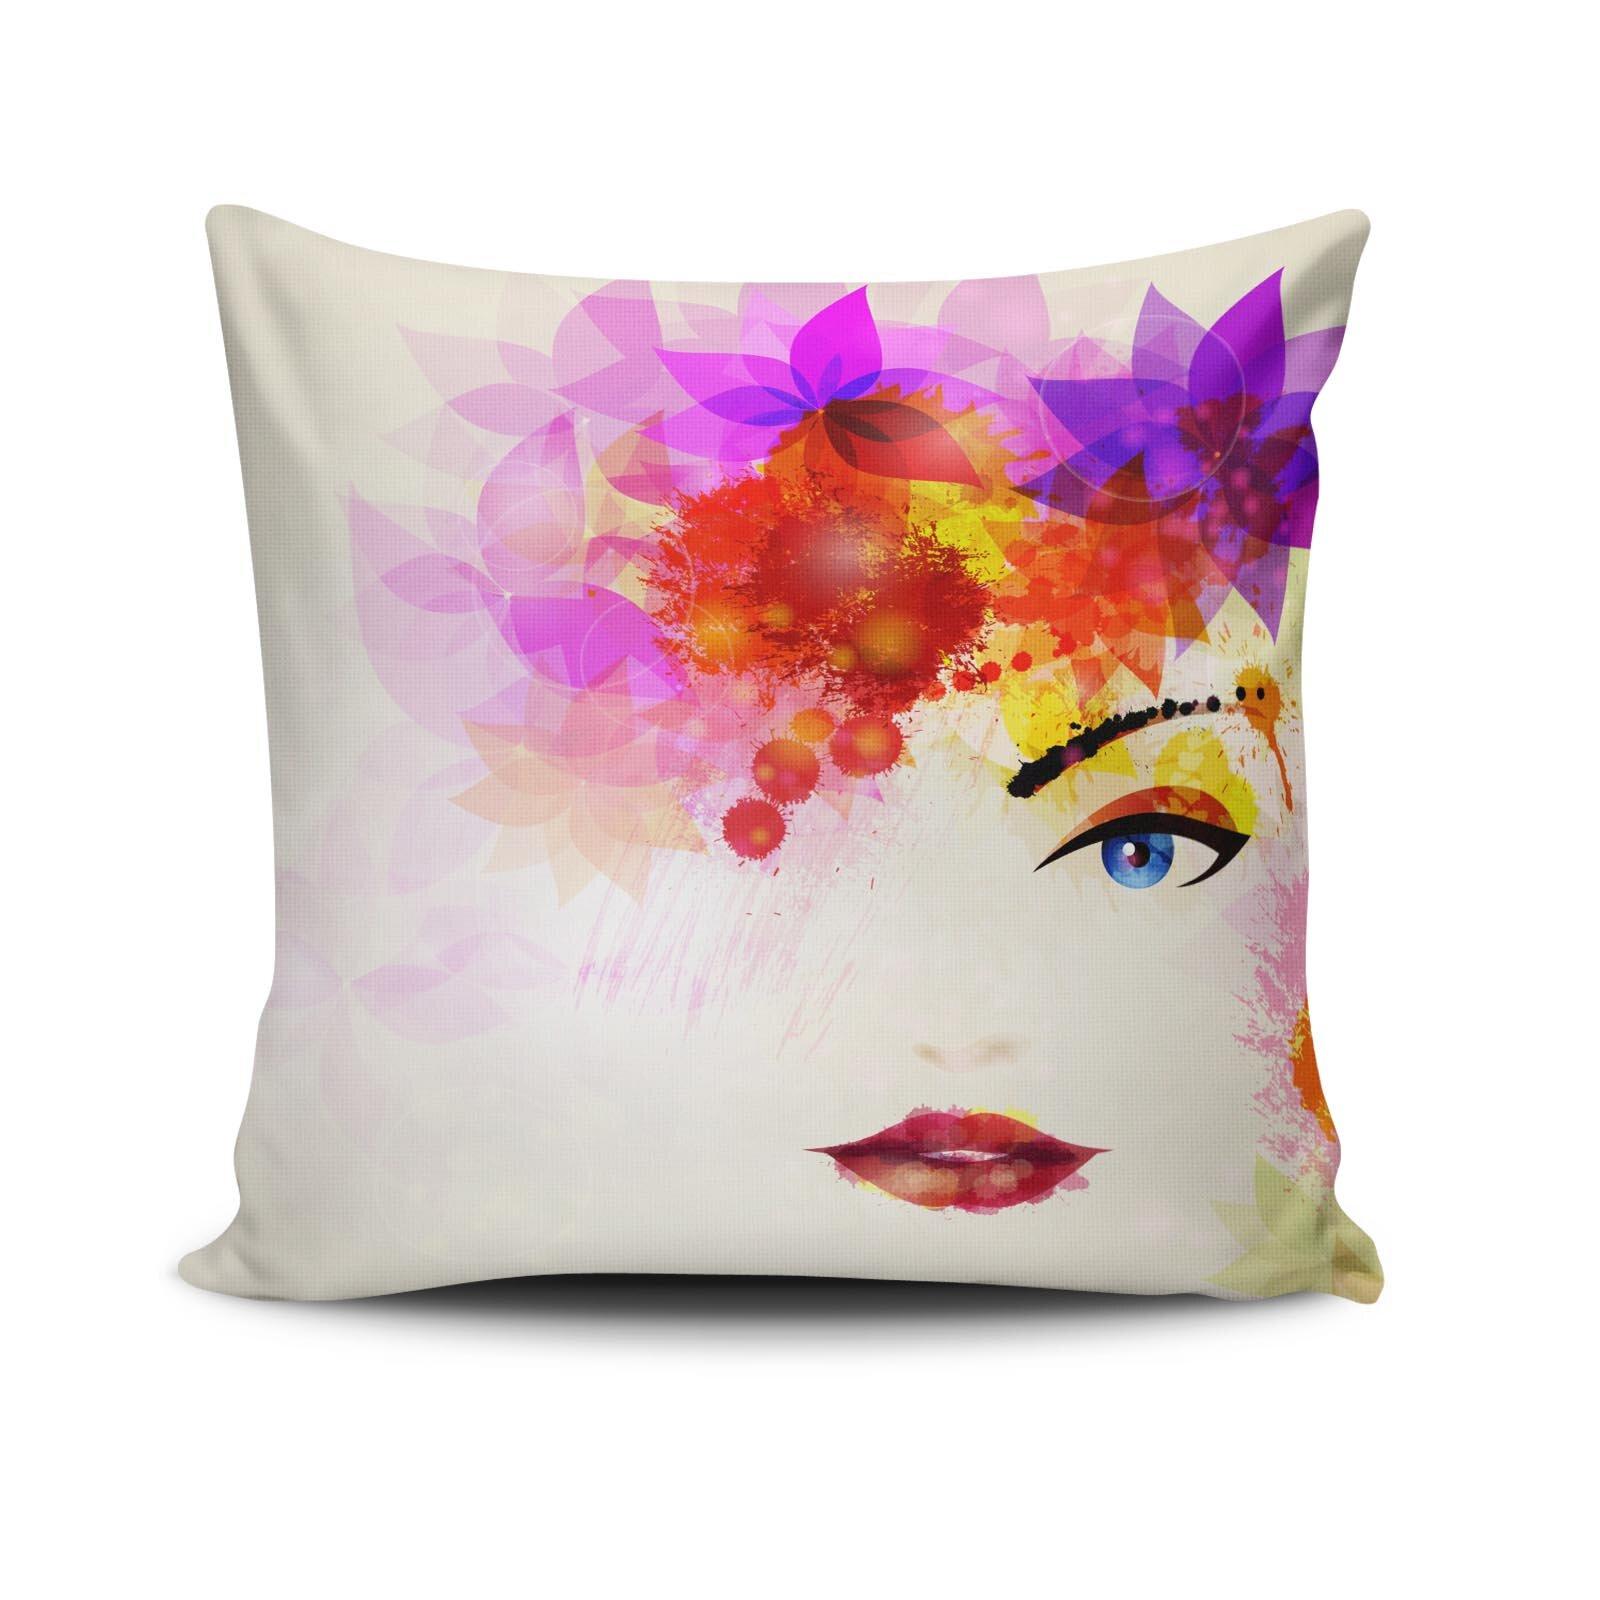 Perna decorativa Cushion Love, Dimensiune: 45 x 45 cm, Material exterior: 50% bumbac / 50% poliester 768CLV0227